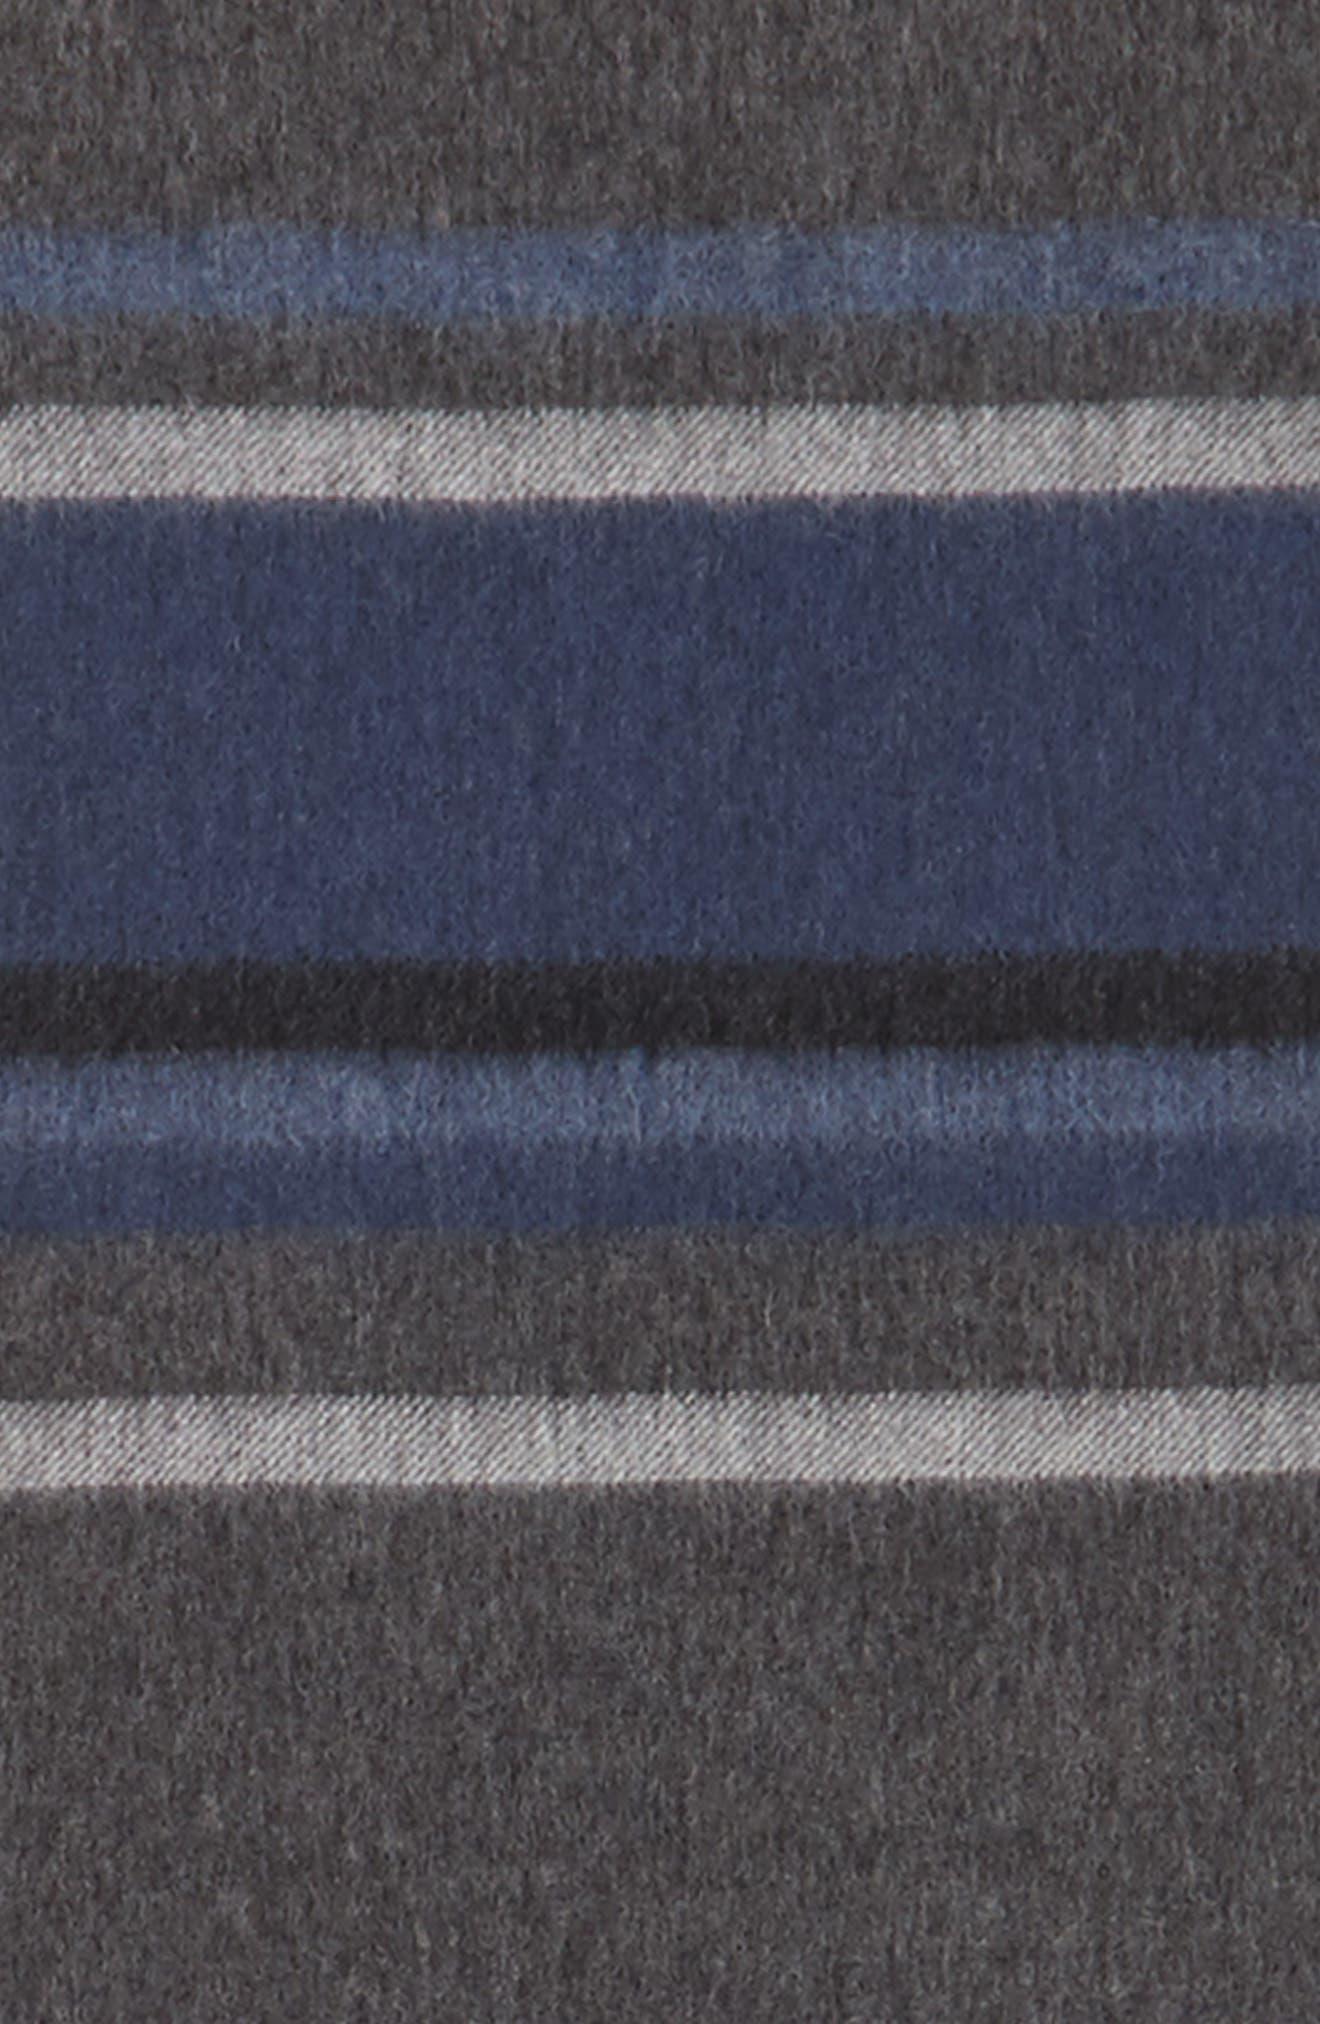 Multistripe Lambswool Scarf,                             Alternate thumbnail 3, color,                             030